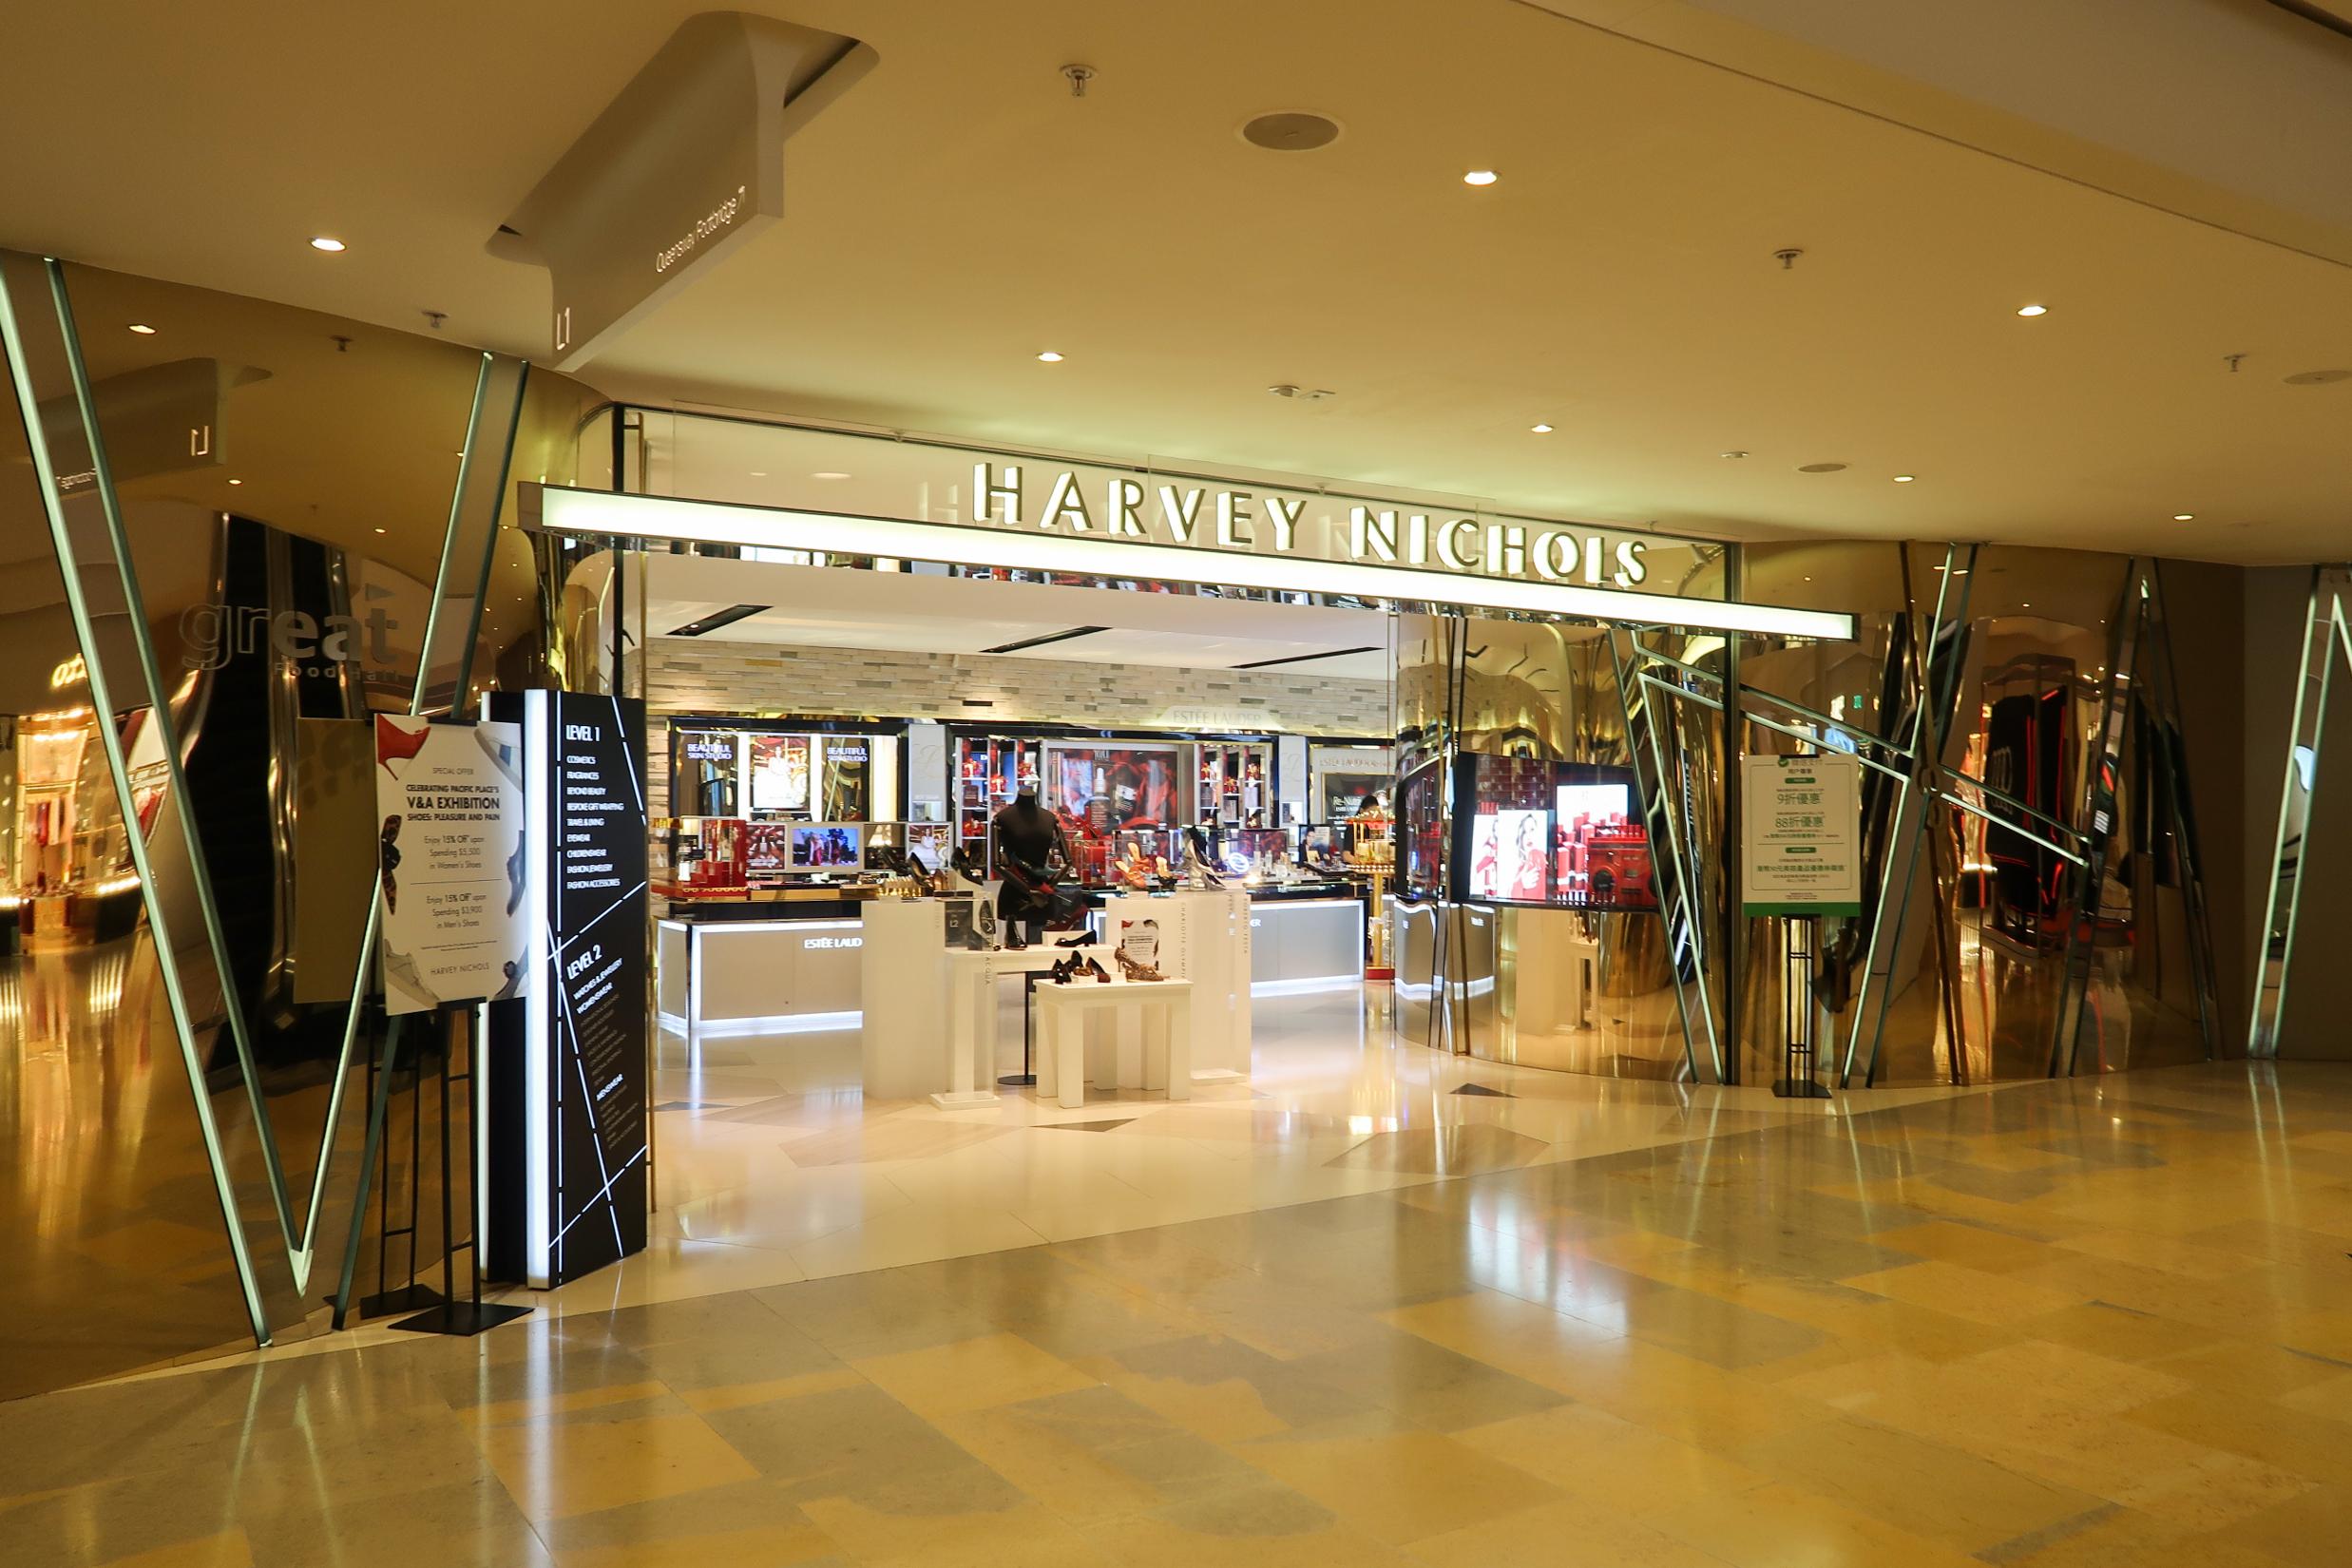 harvey nichols-return_policy-how-to